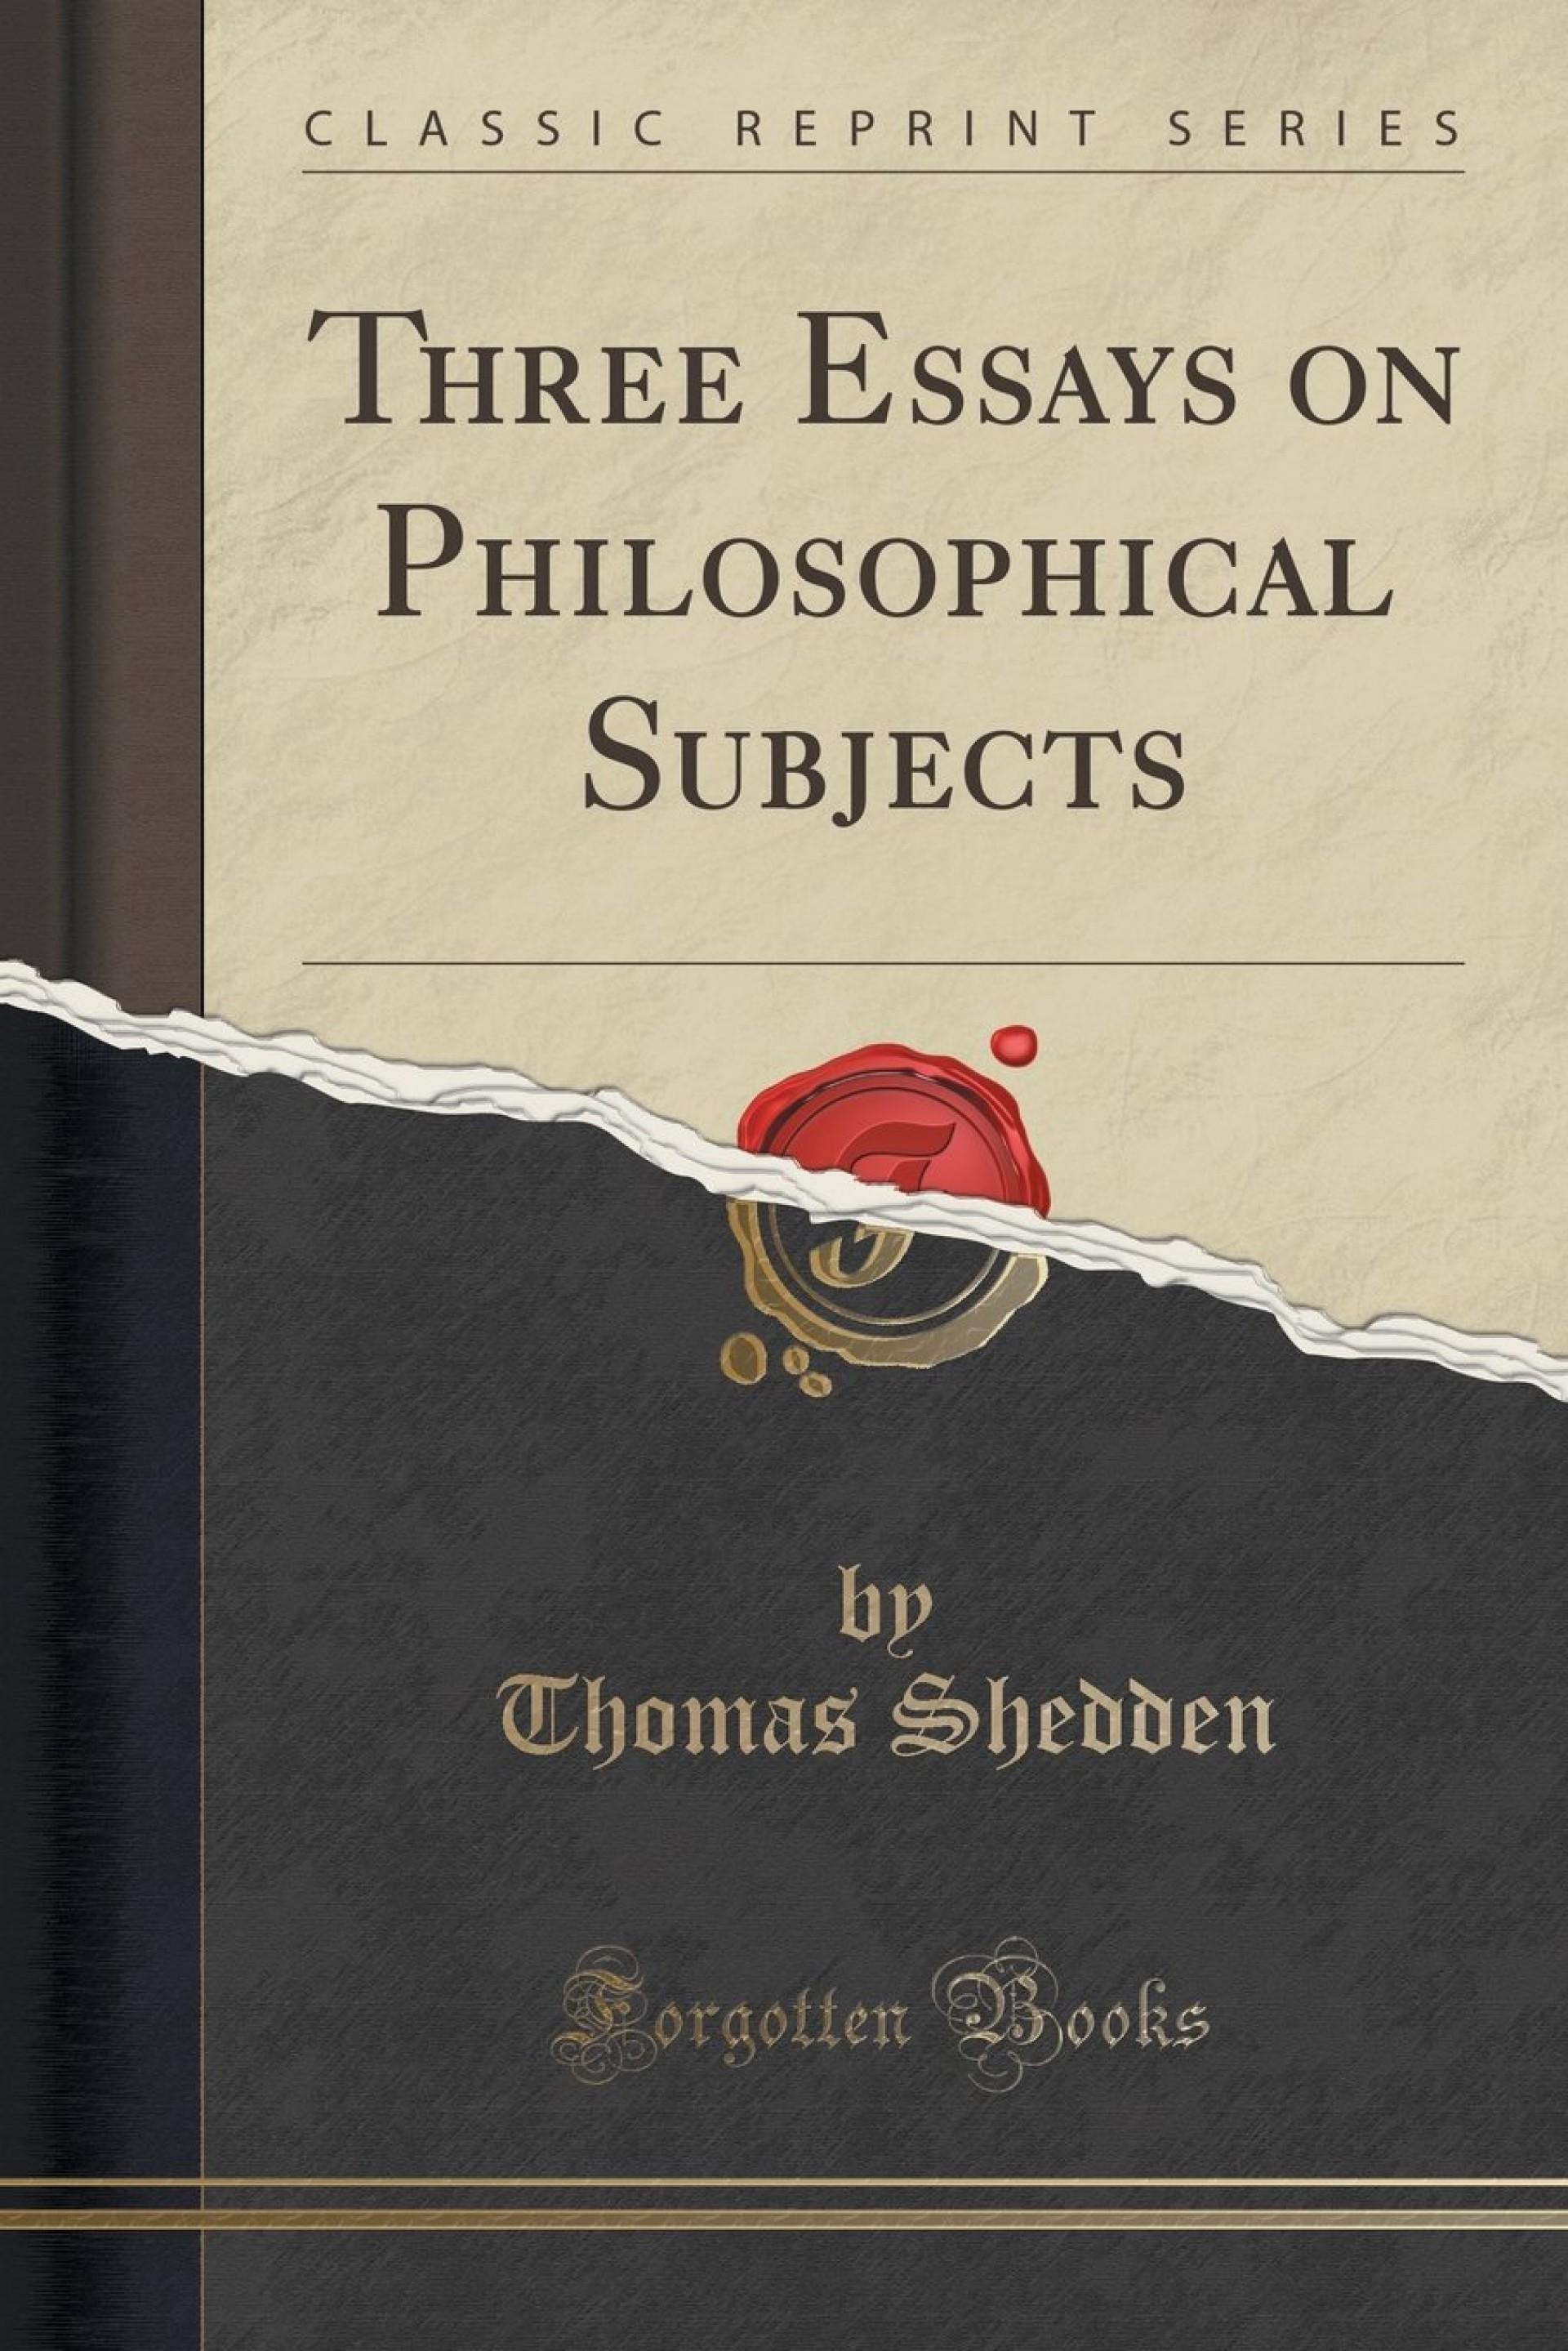 005 Essays On Philosophical Subjects Essay Example 71am4oec9 Best Smith Pdf 1920